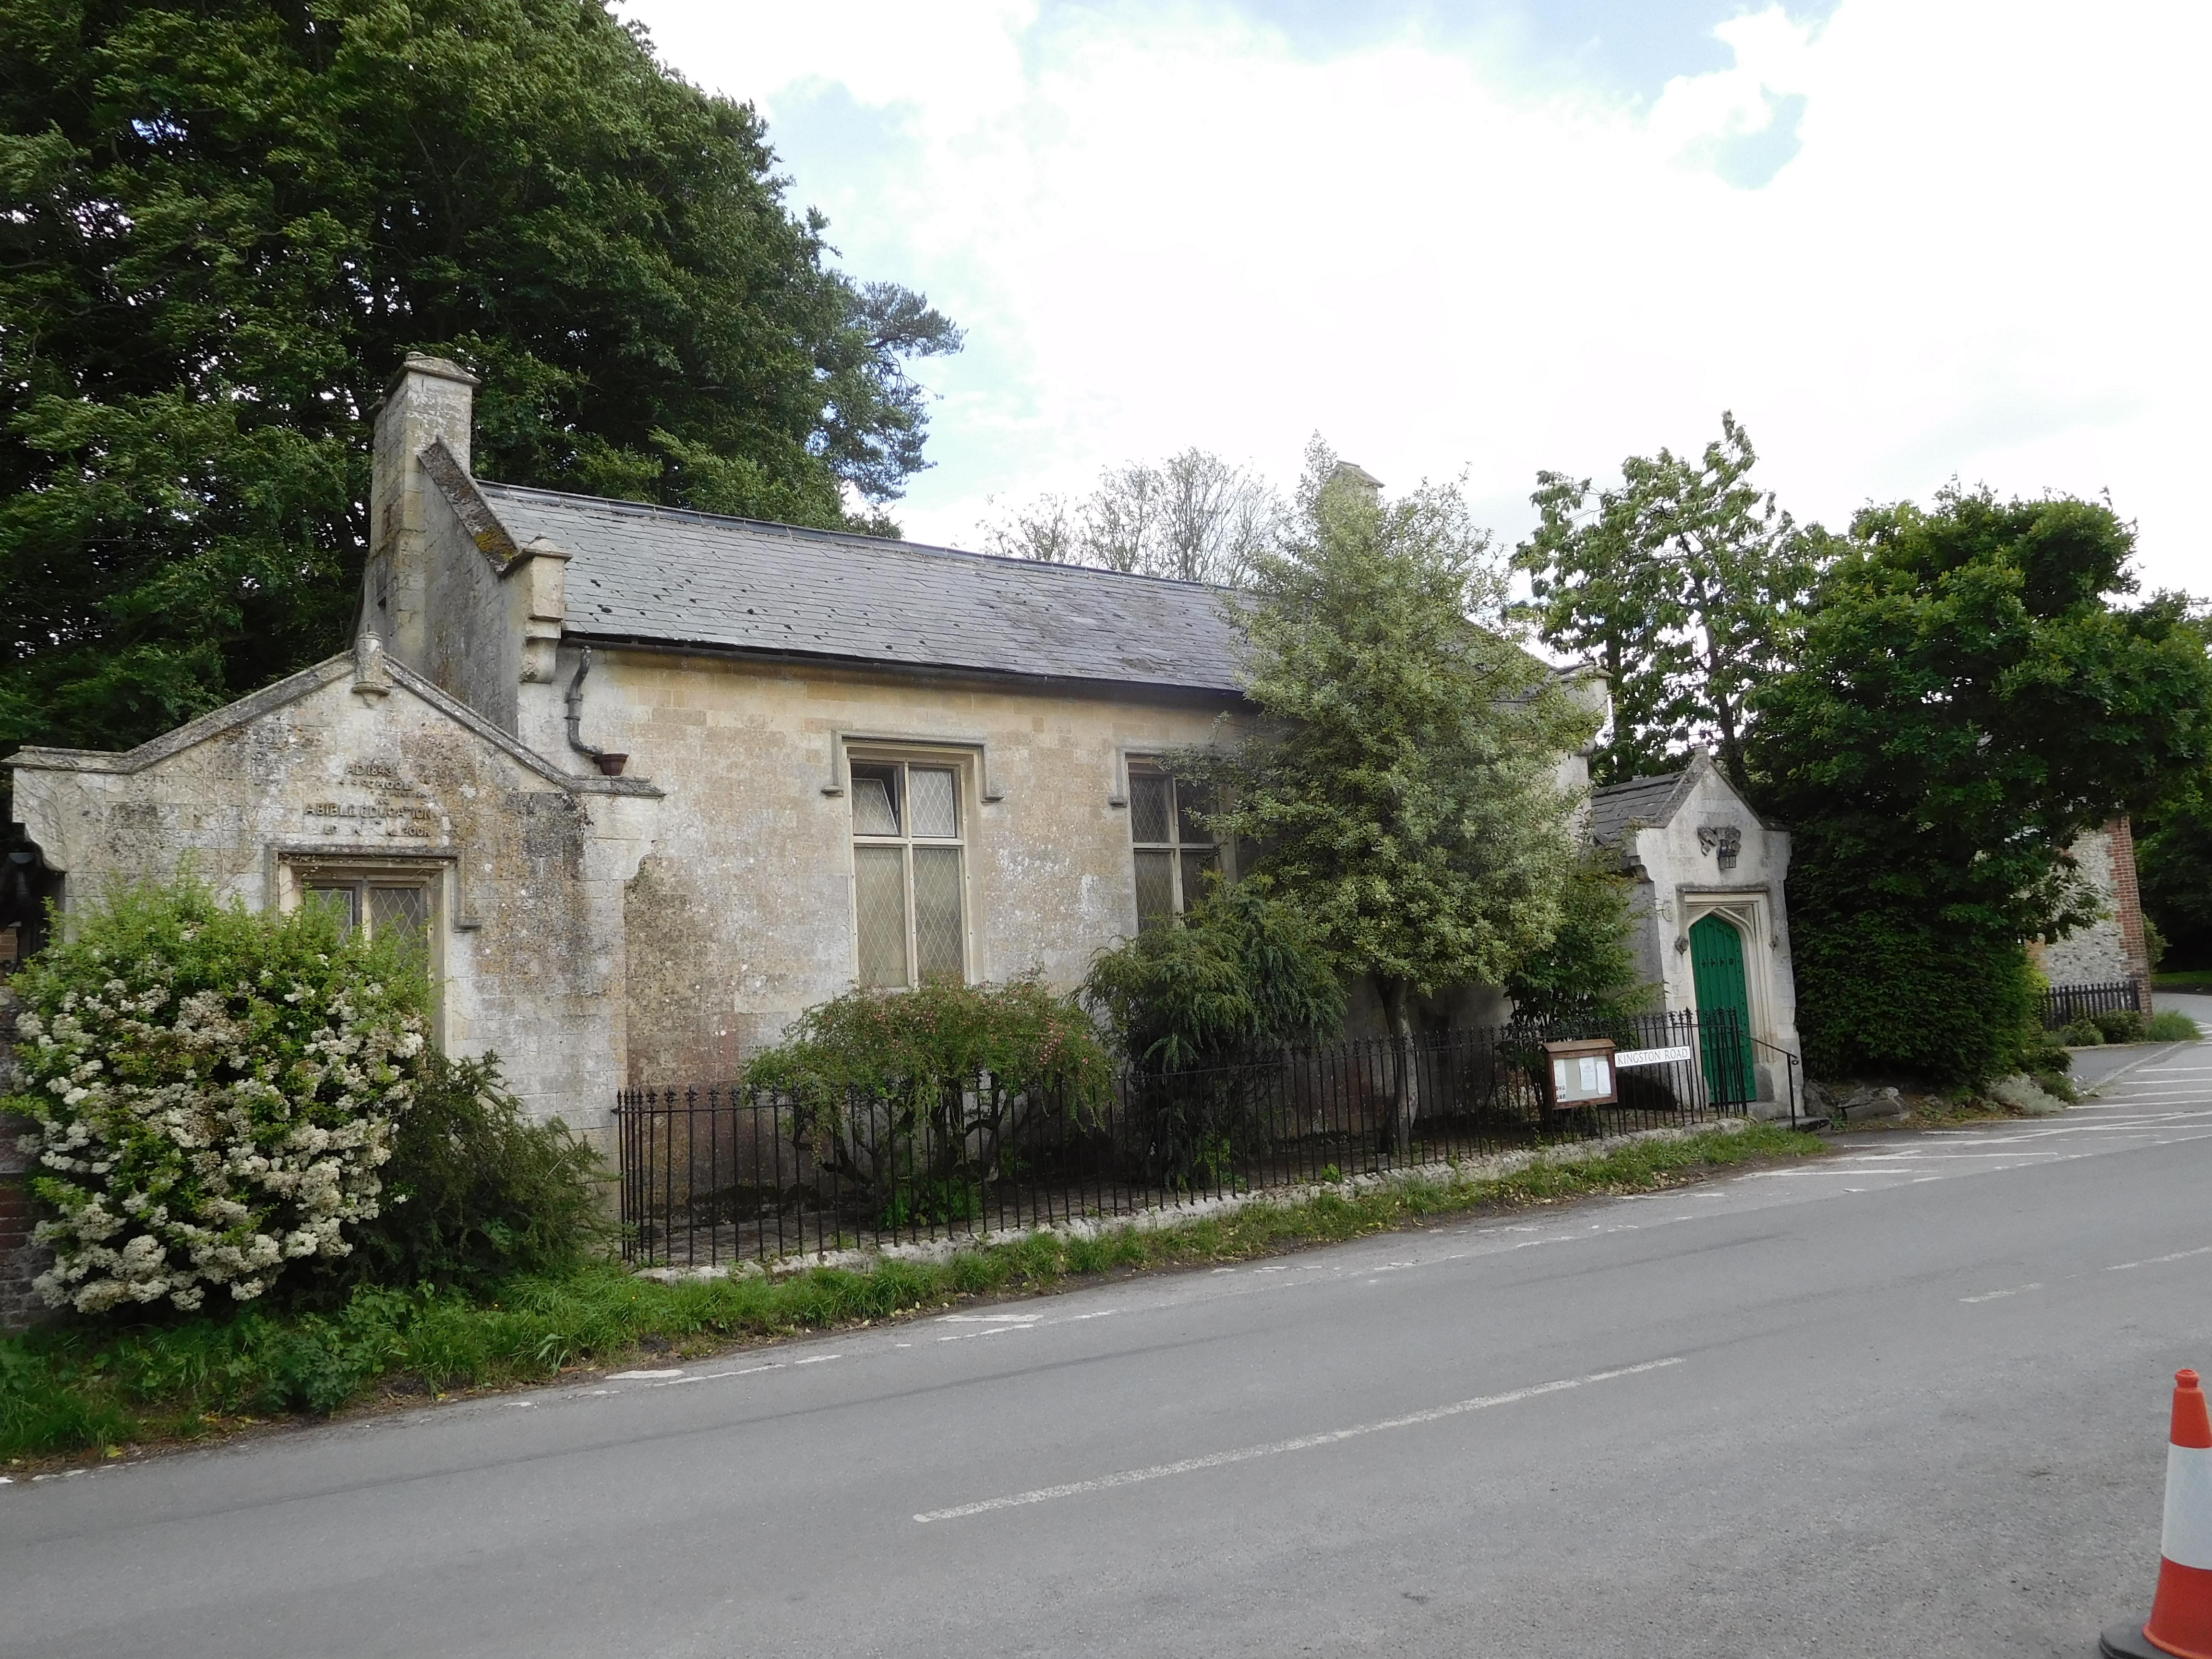 Shalbourne Village Hall